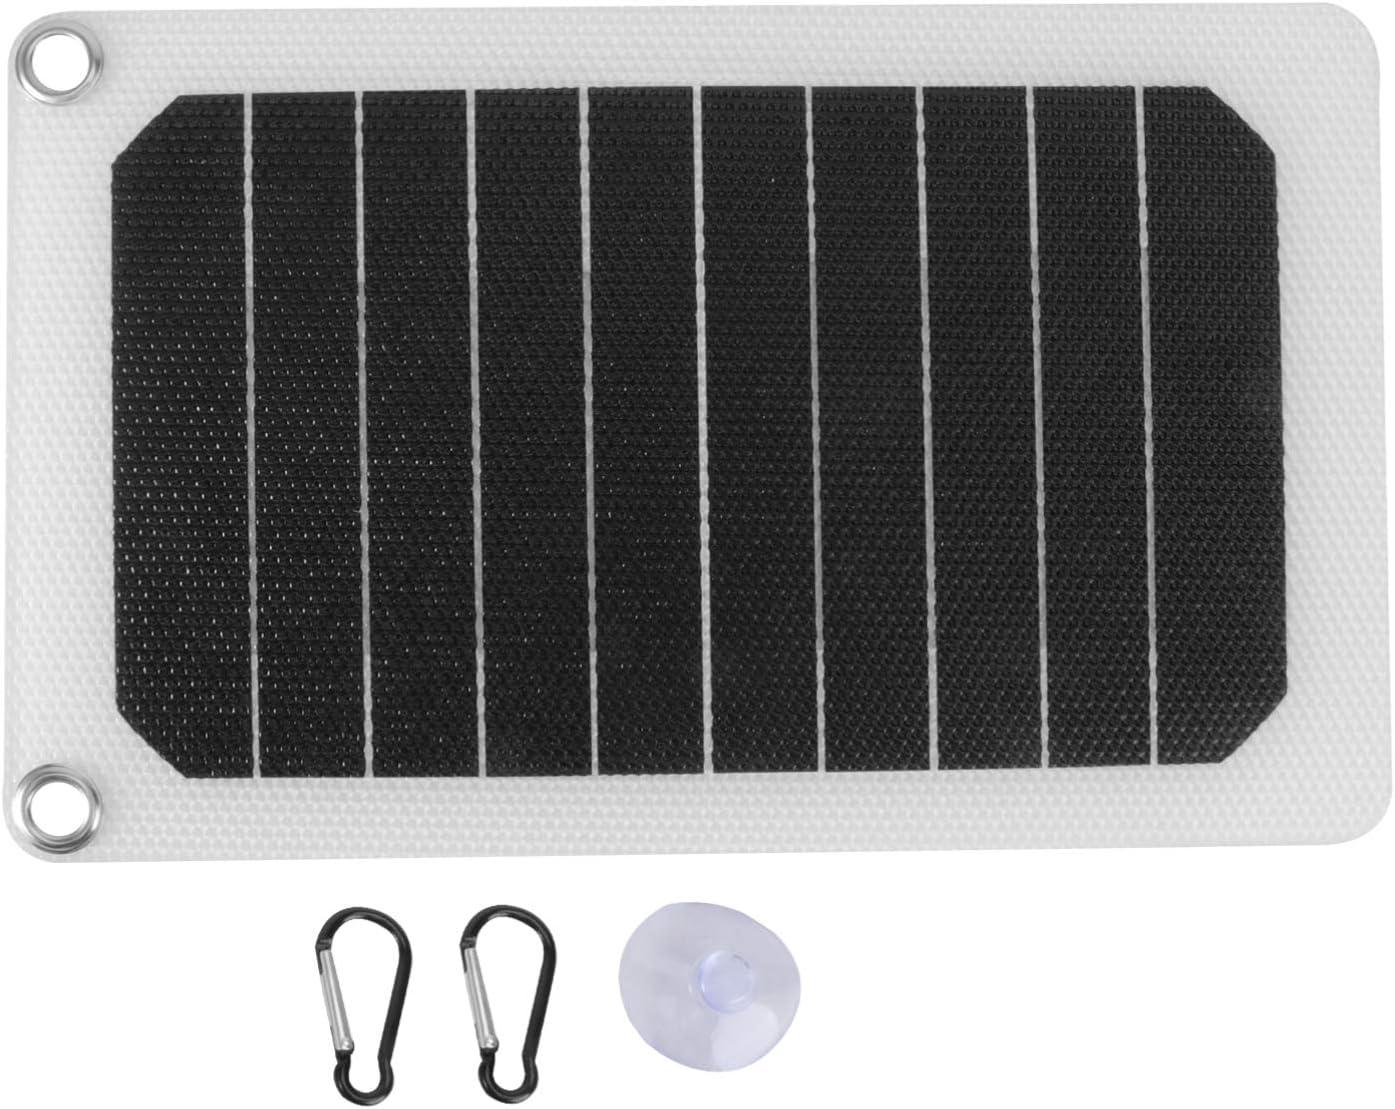 YARNOW 휴대용 태양 전지 패널 여름 캠핑을위한 접이식 태양 전지 충전기 패널